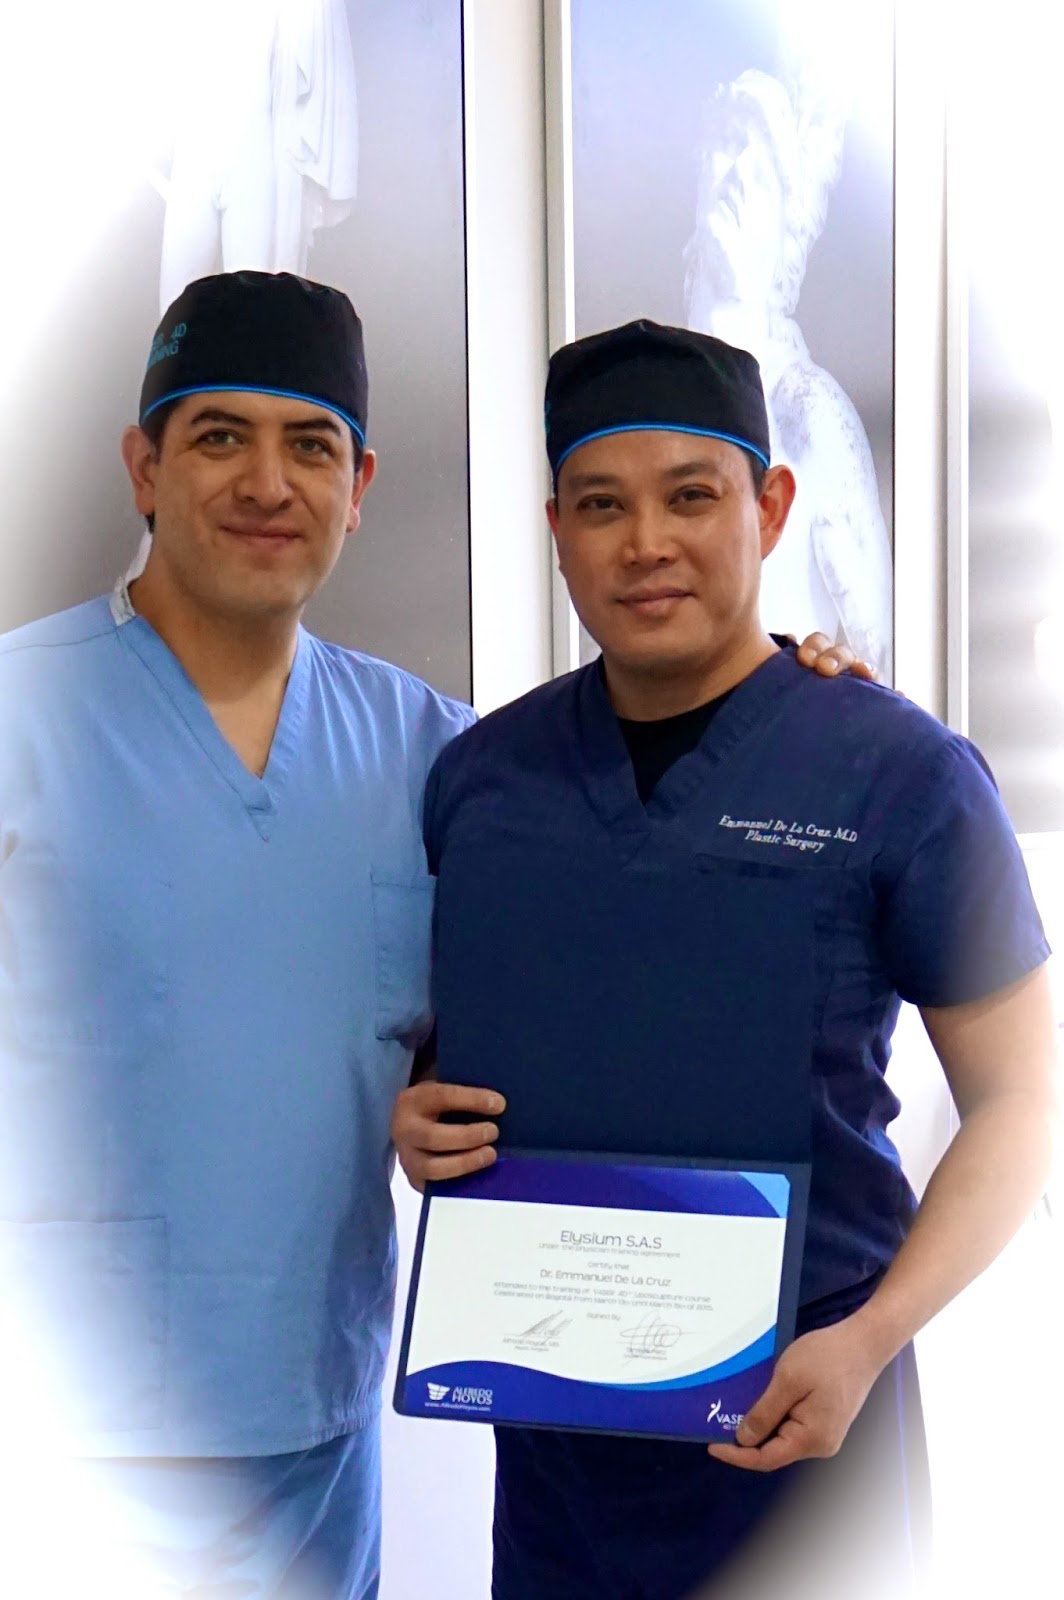 Plastic surgery in bogota colombia